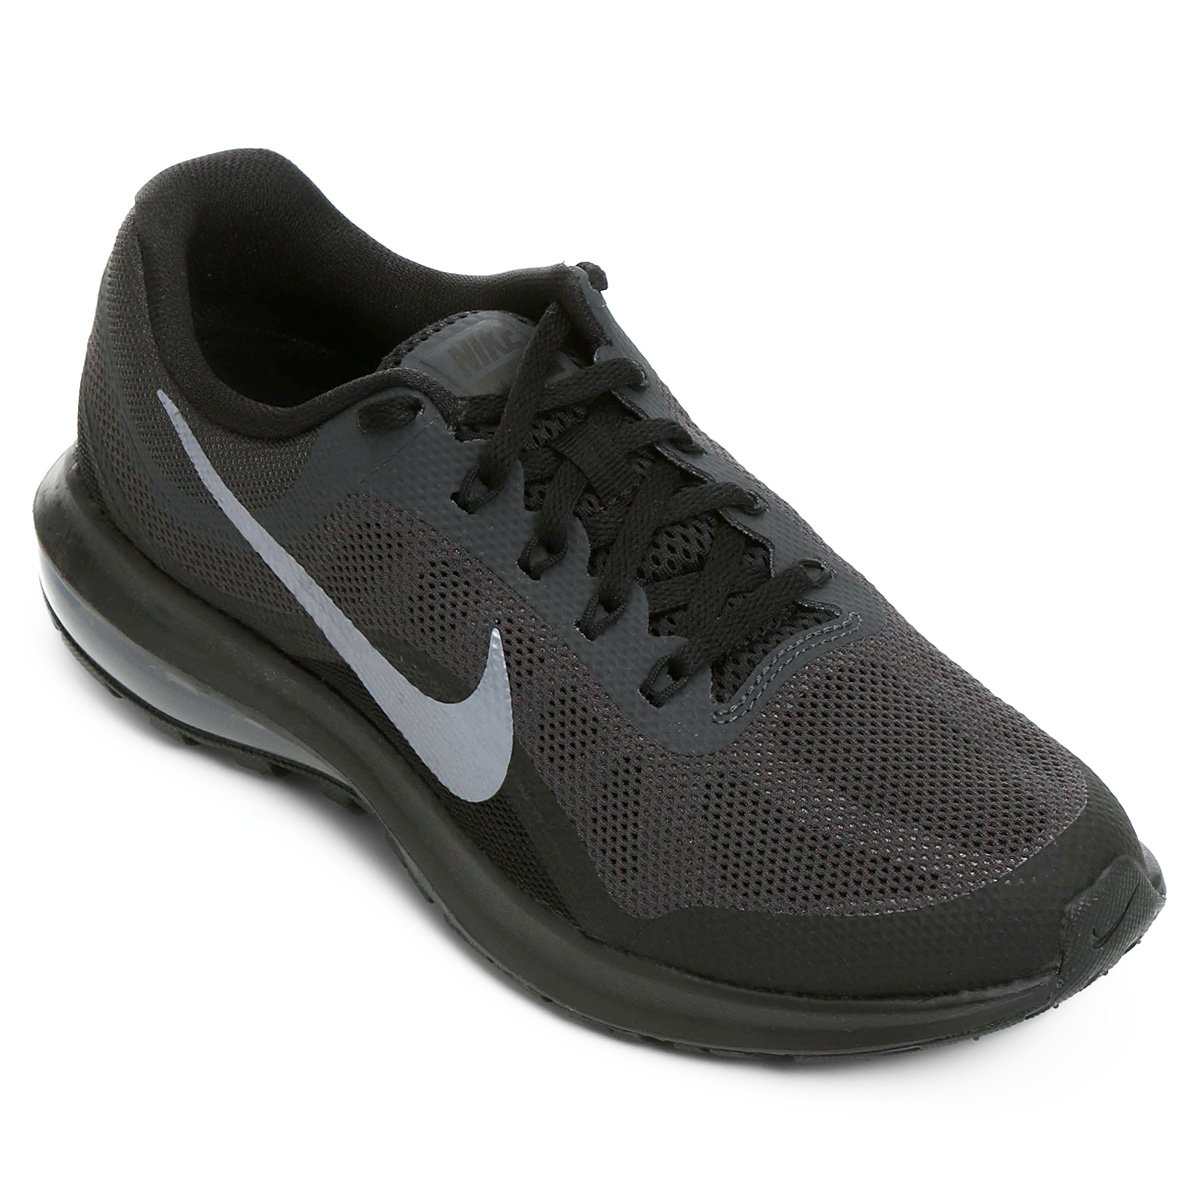 3032cef042 Tênis Nike Air Max Dynasty 2 Masculino | Loja do Inter